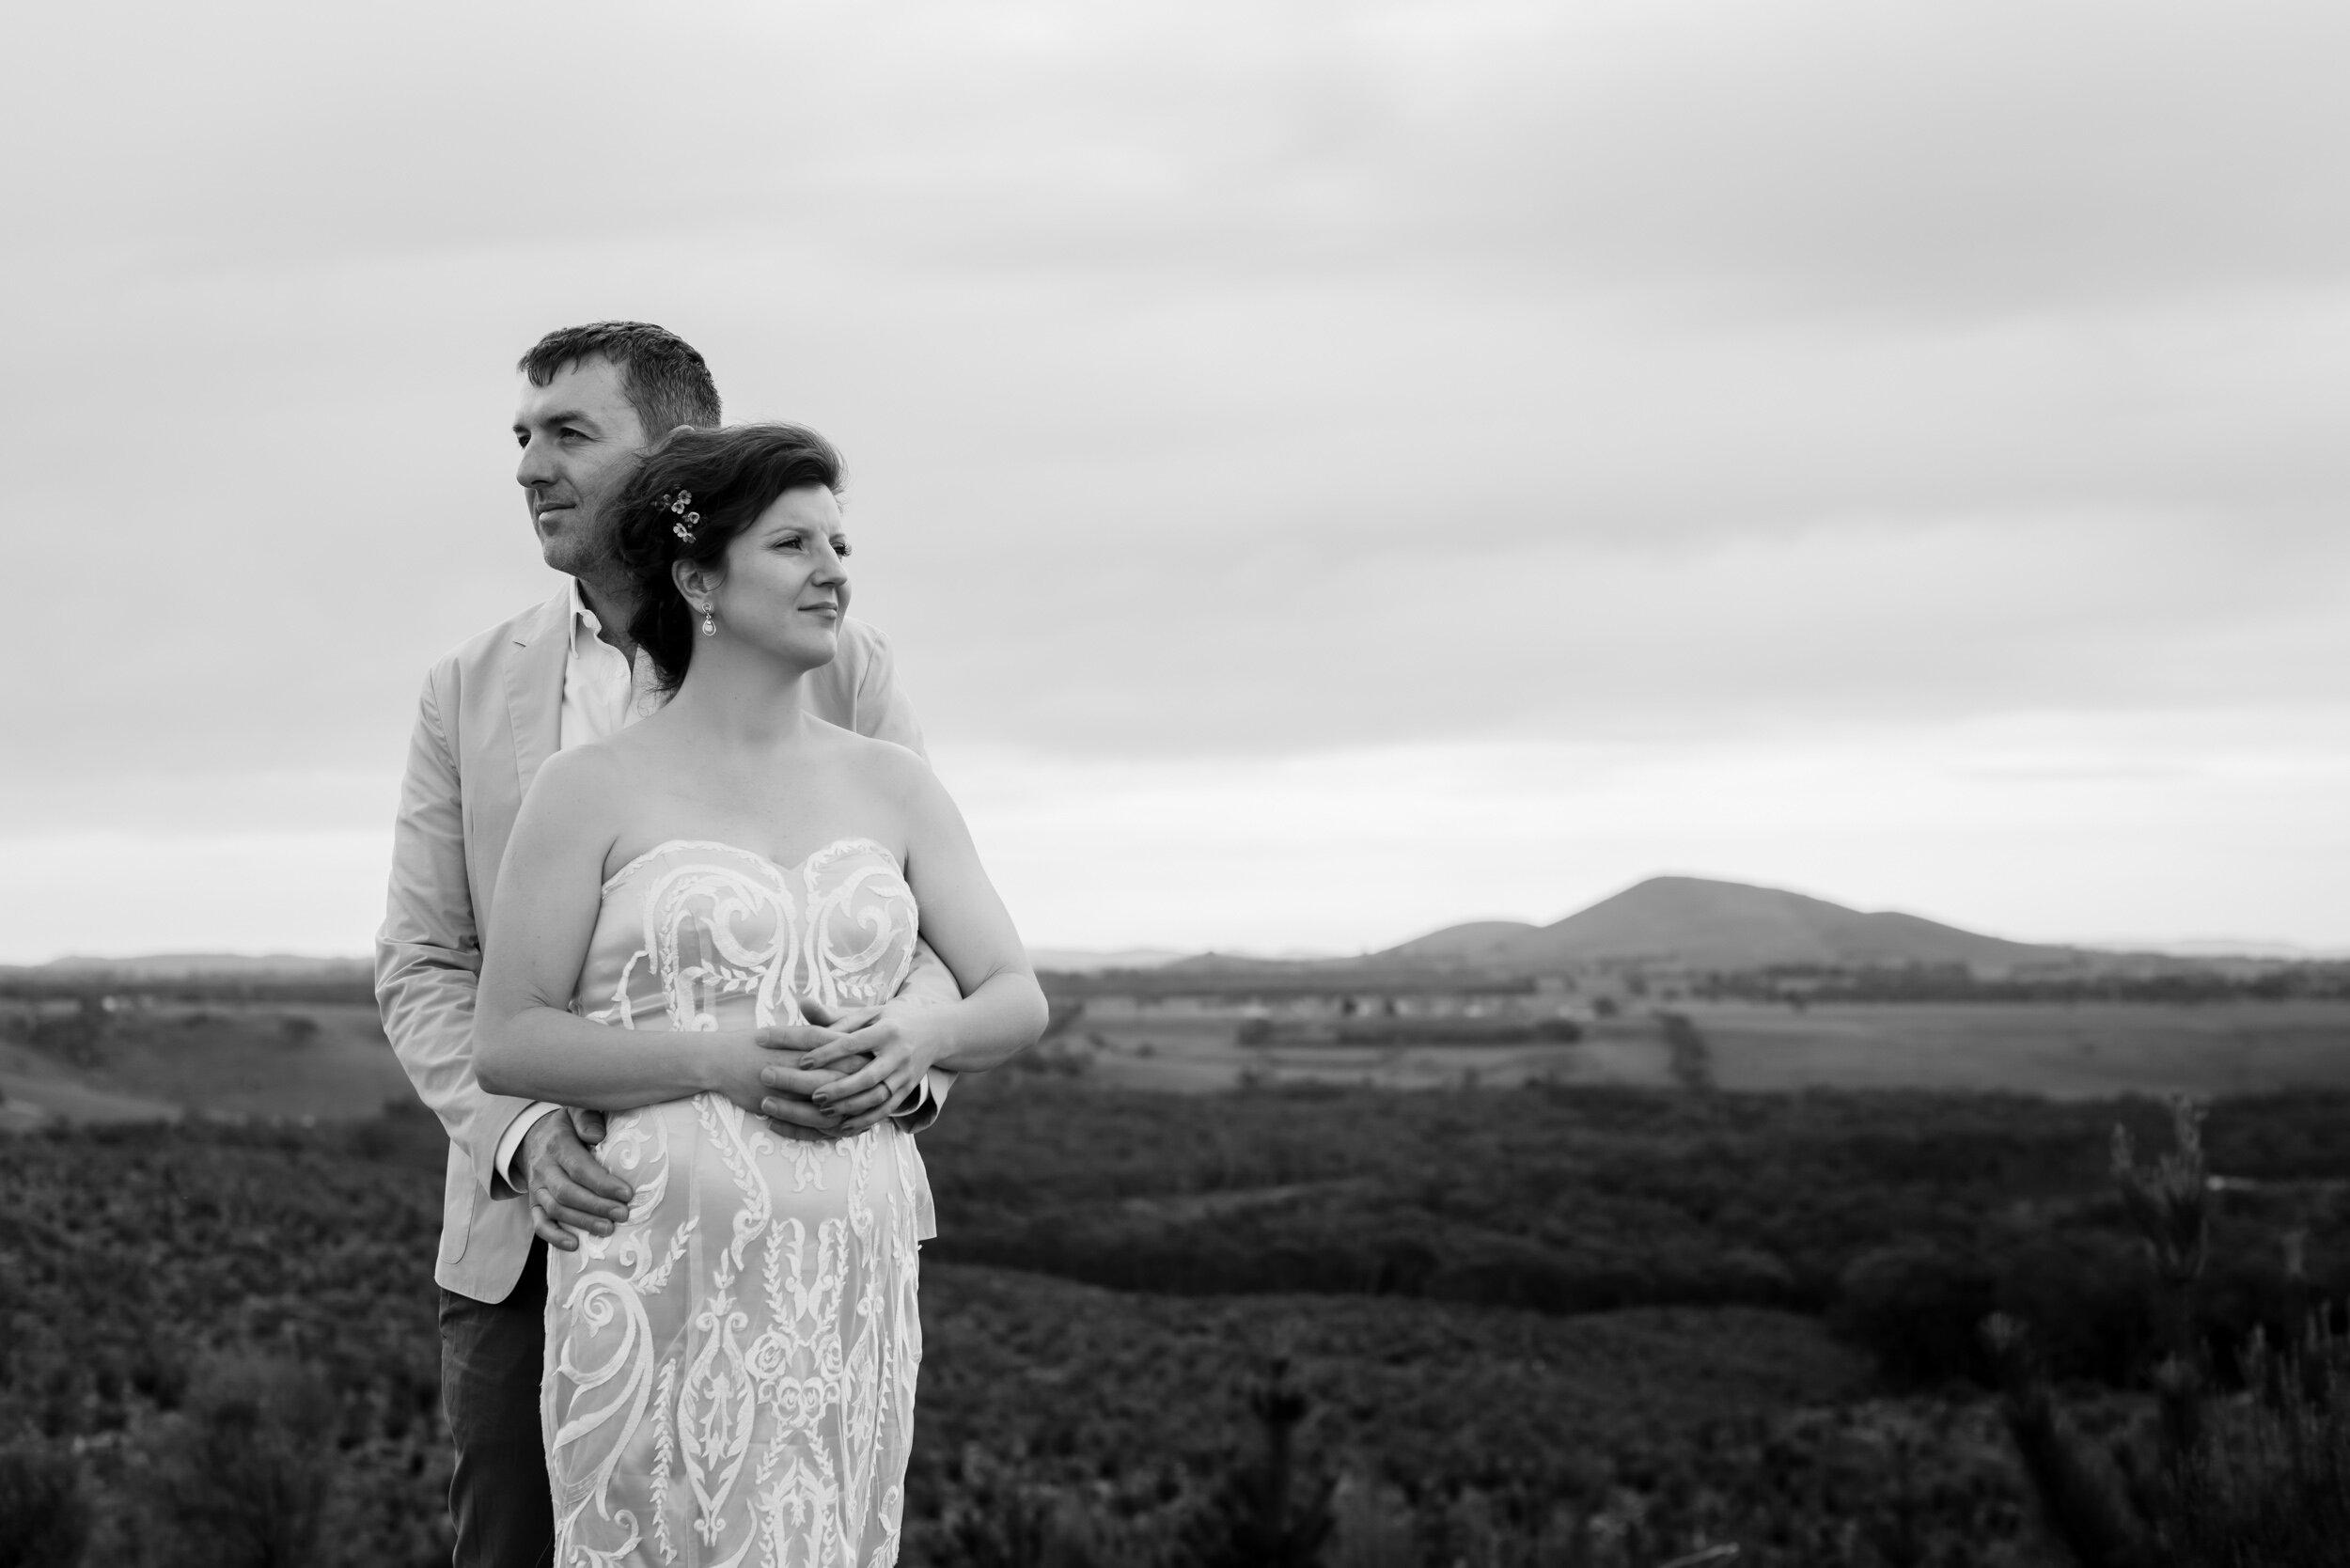 Narida & Tony - LaFranchie Hut | Daylesford